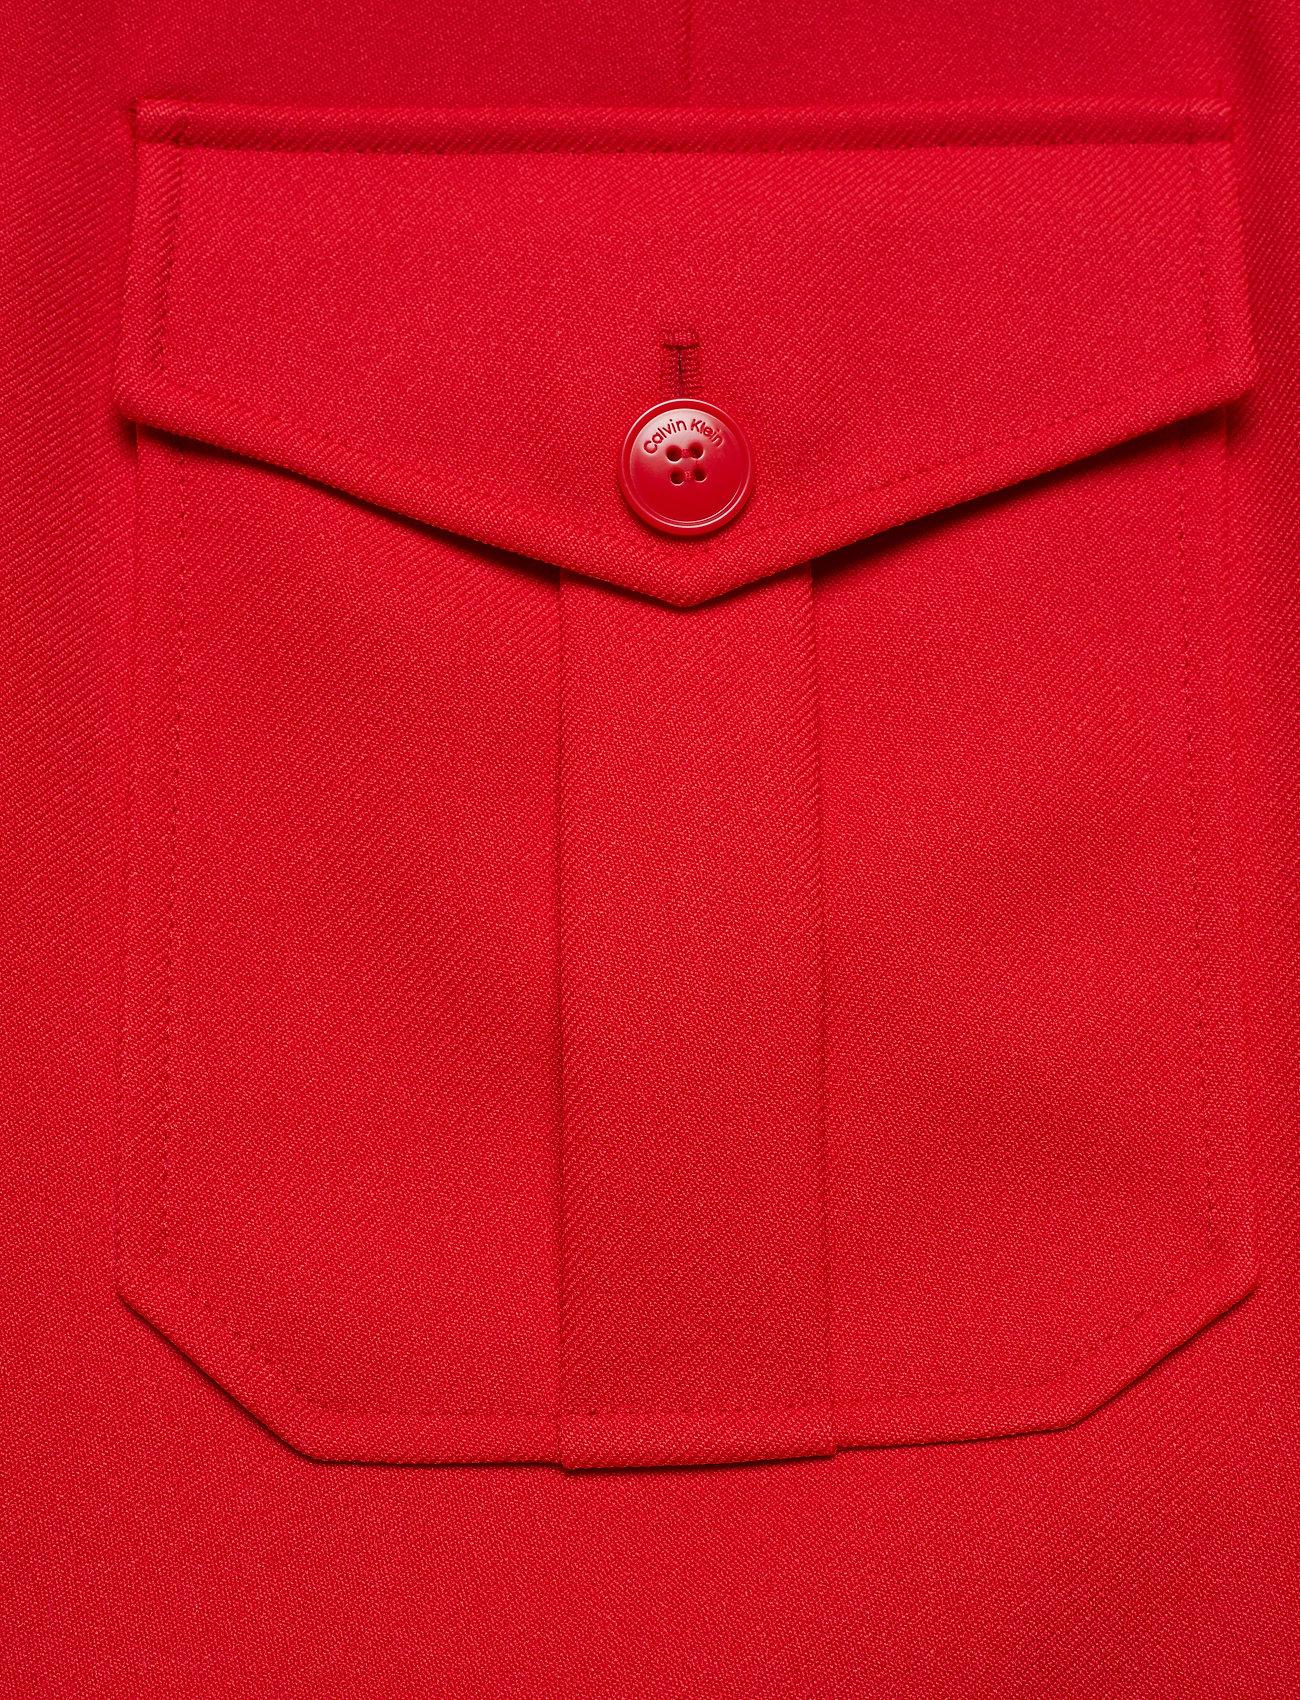 Calvin Klein Uniform Twill A-line Pkt Skirt - Kjolar